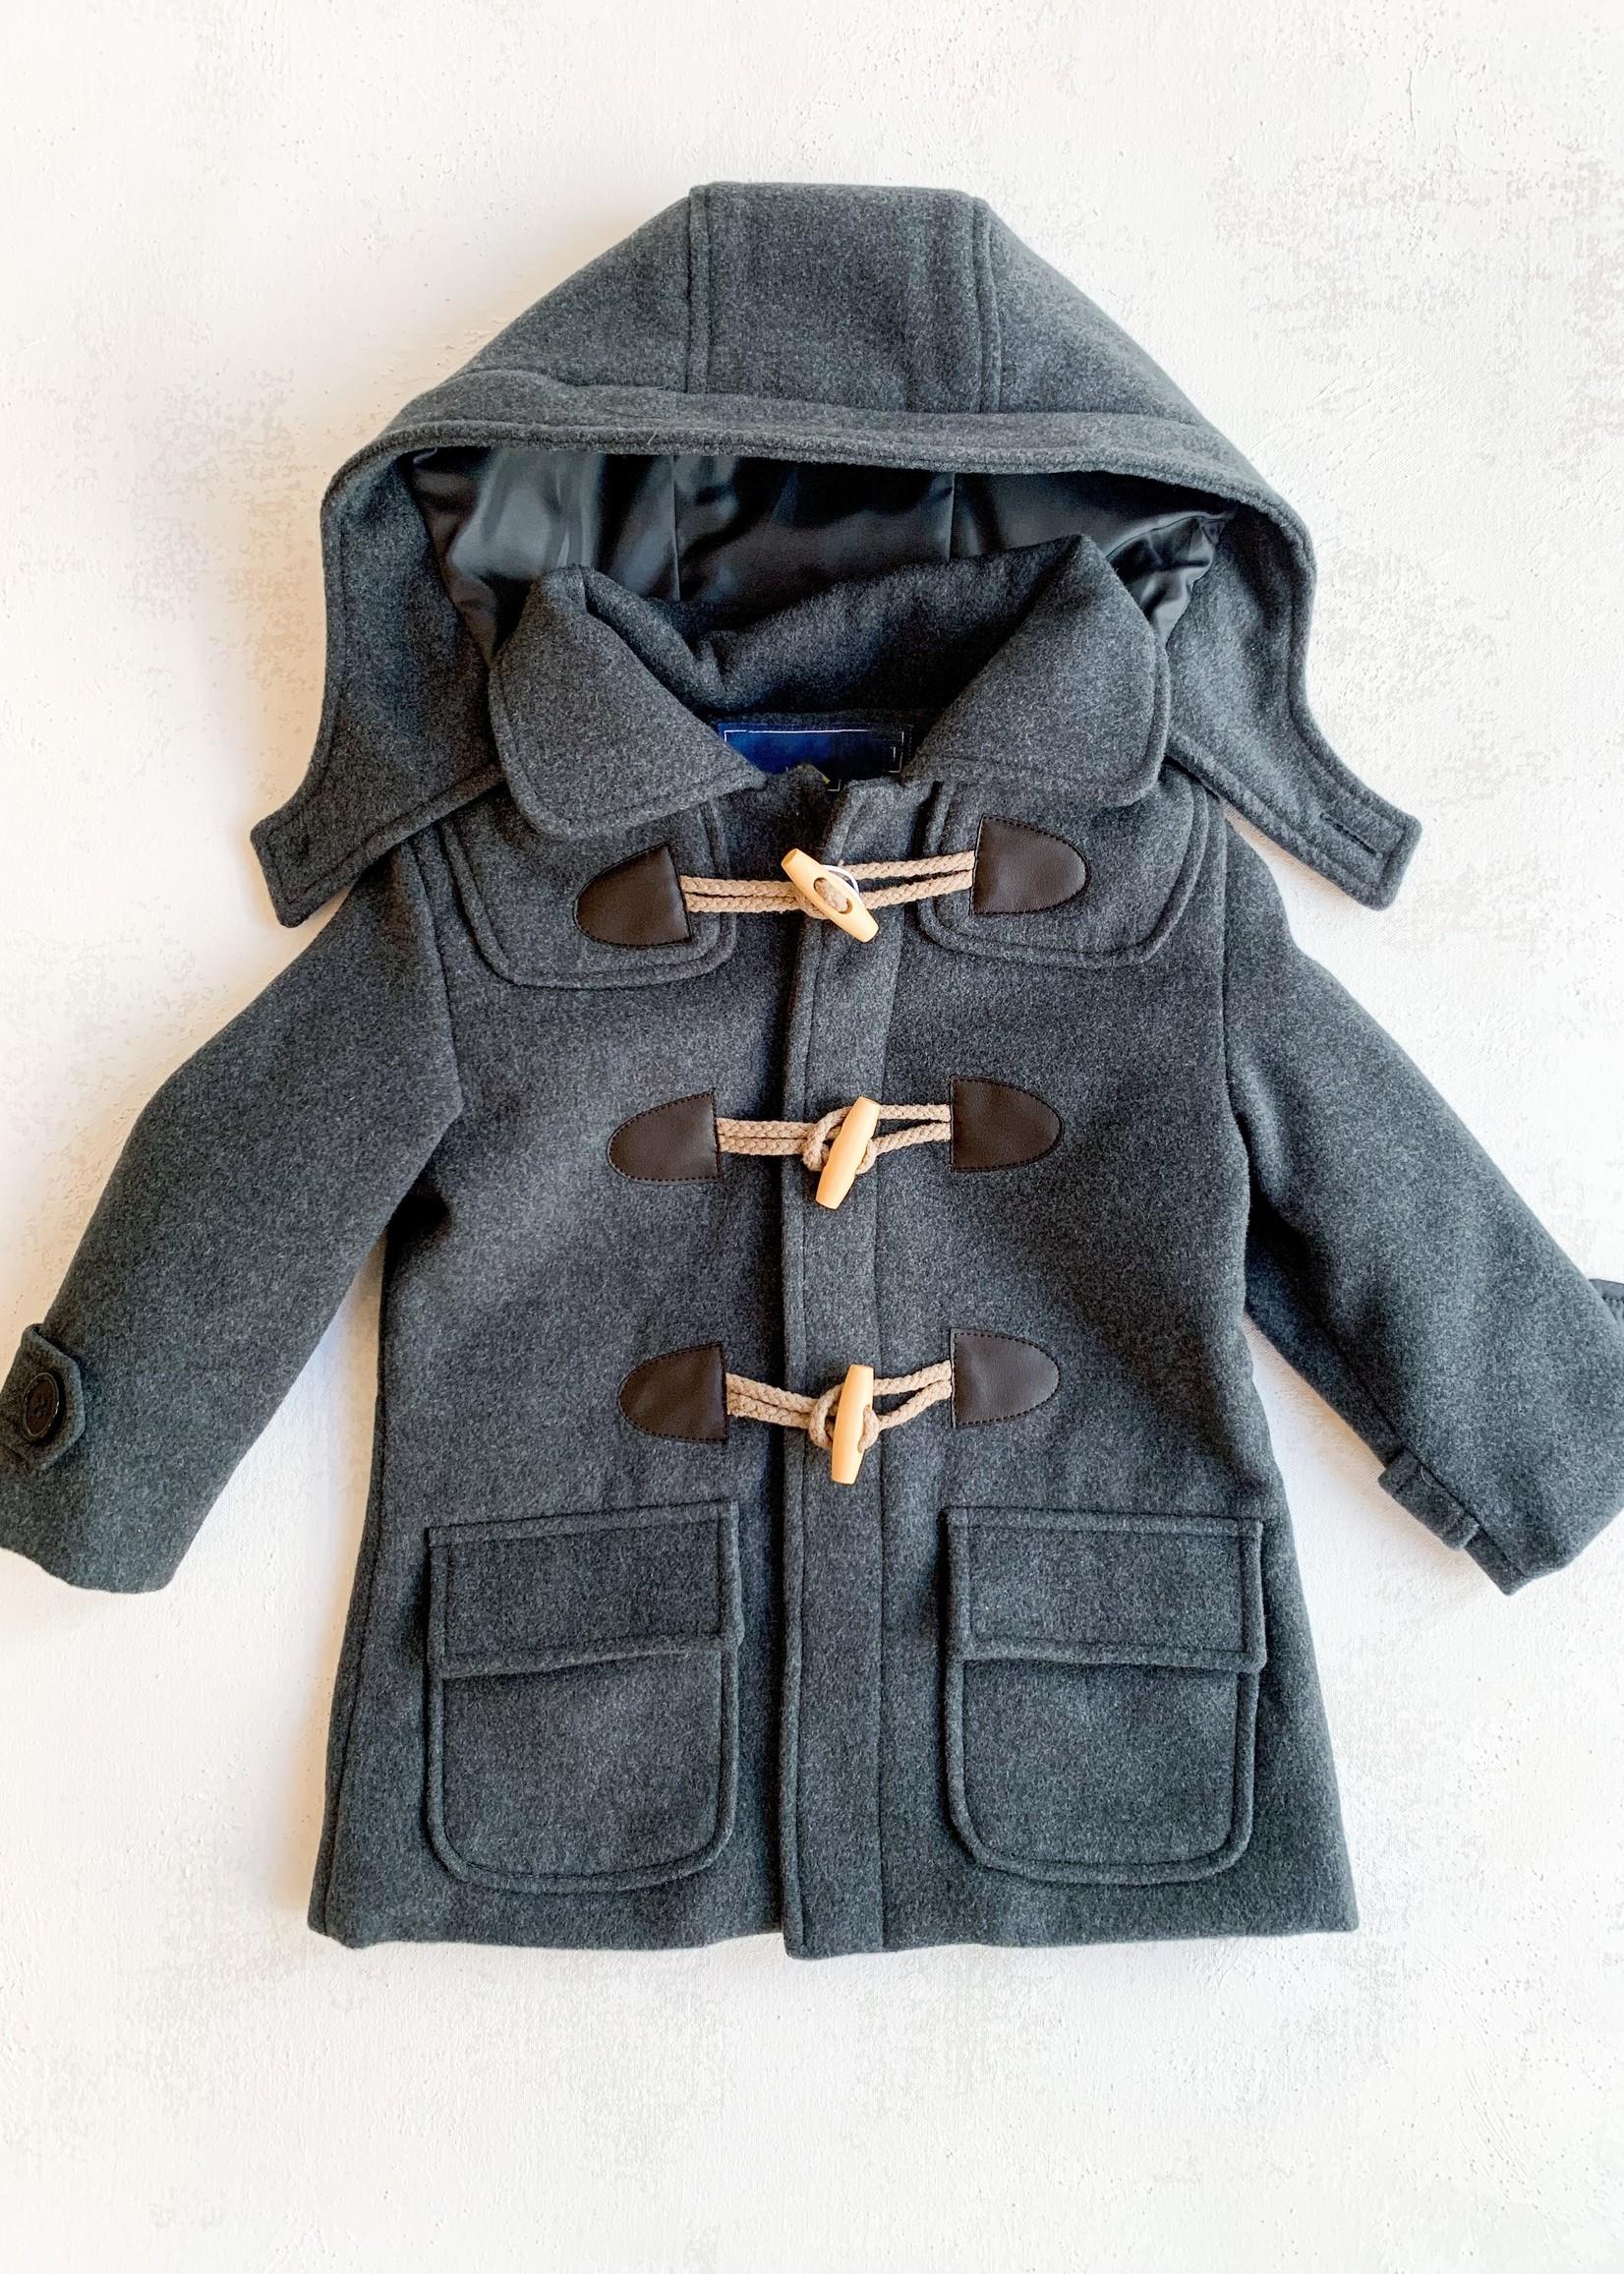 Elitaire Petite Construction Overcoat in Charcoal